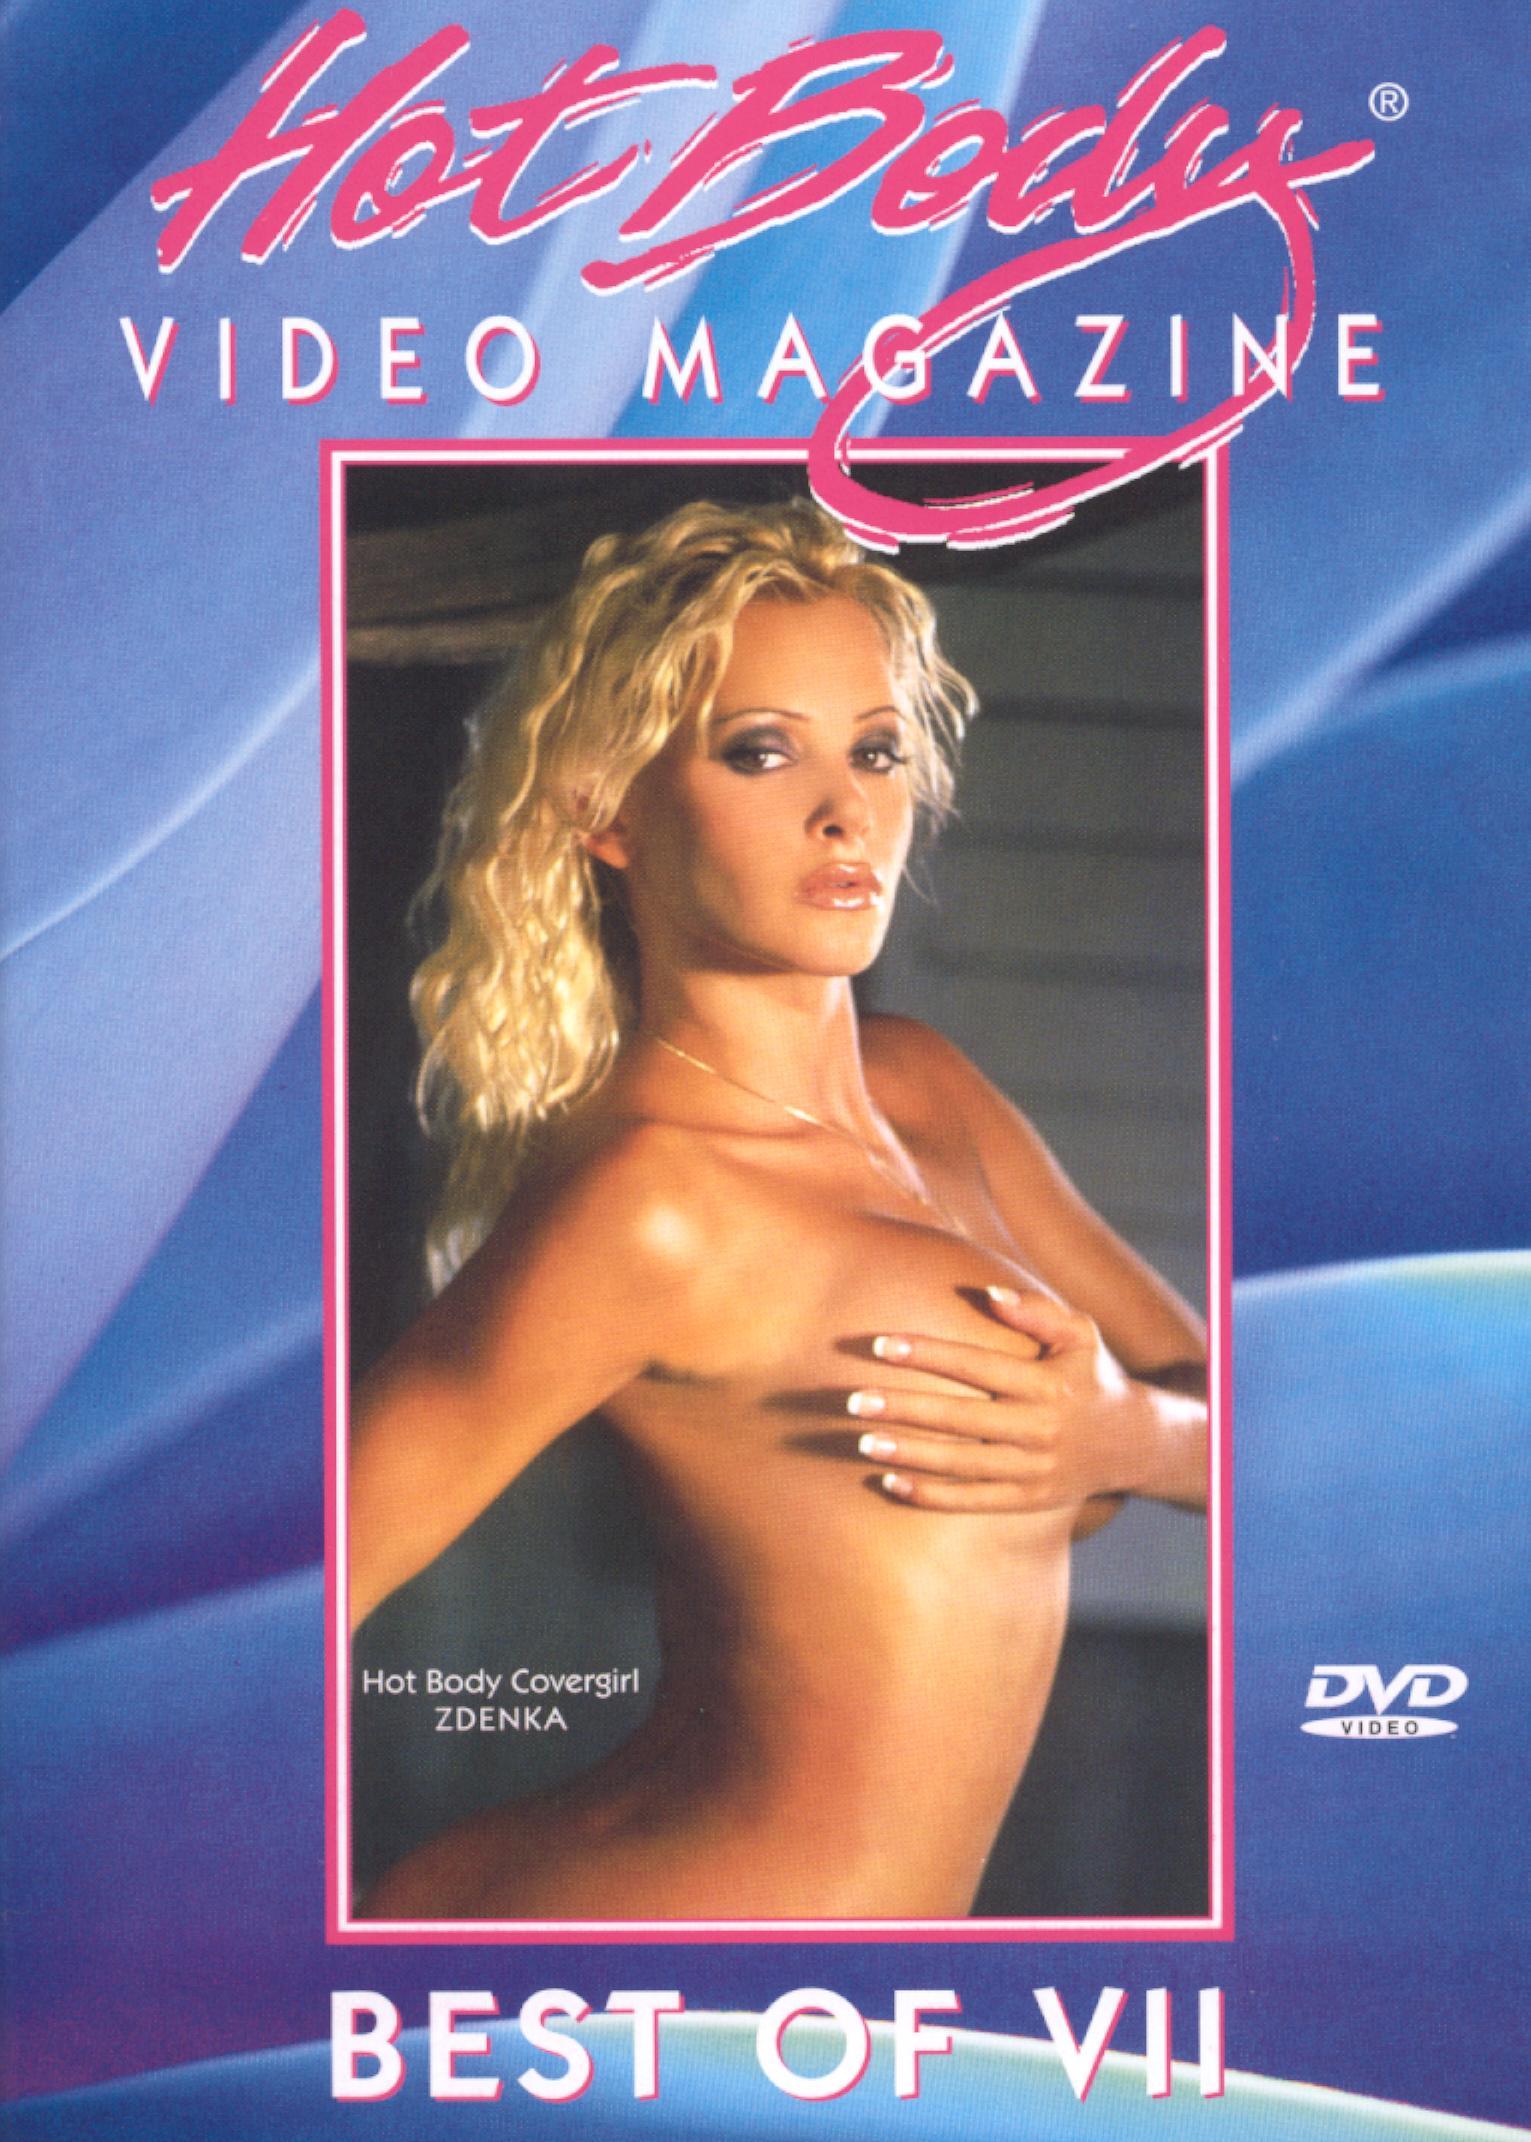 Hot Body Video Magazine: The Best of Hot Body Video Magazine, Vol. VII